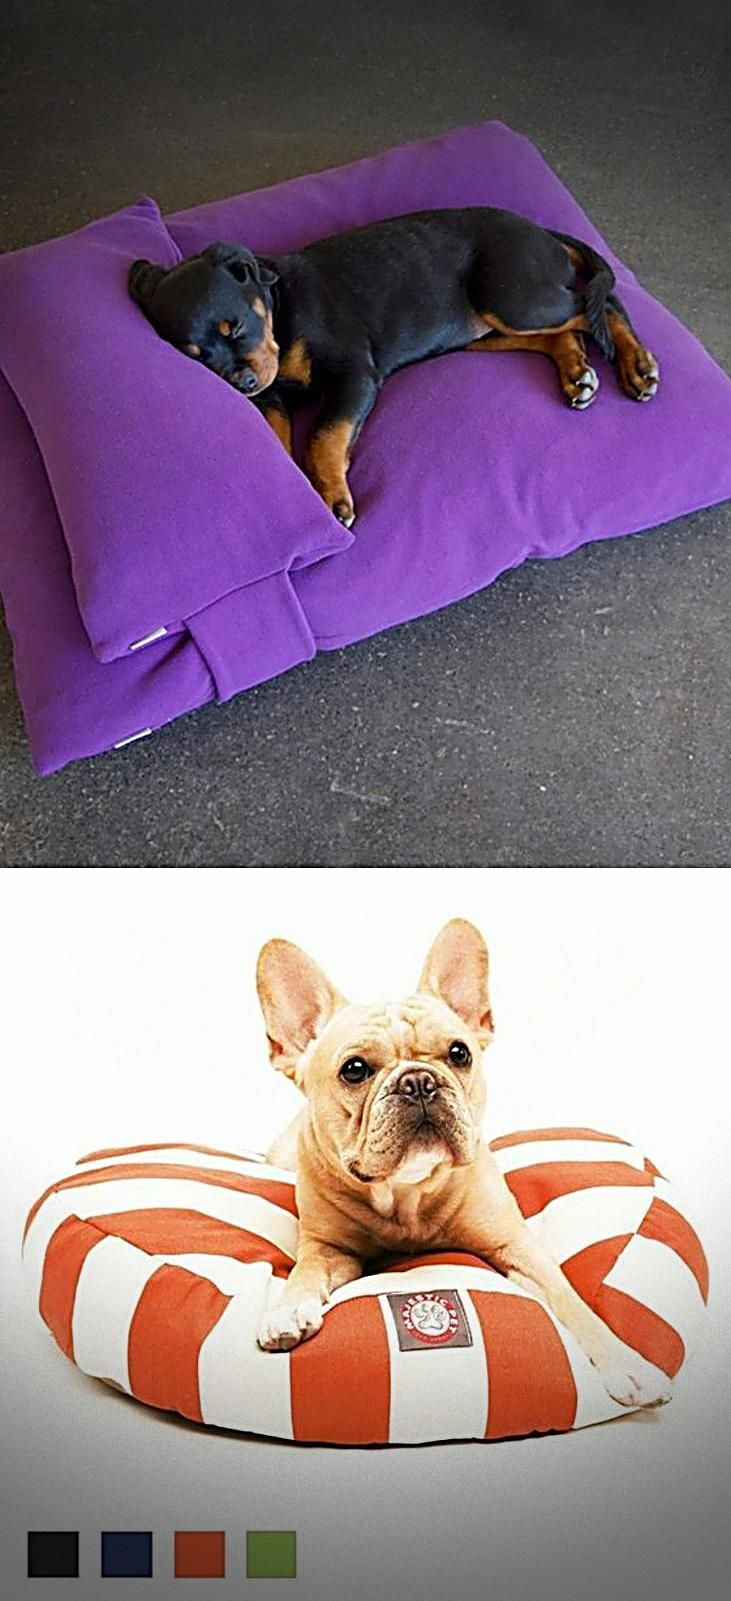 Ultimate Dog Bed Cool Dog Beds Kong Dog Bed Dog Ramp For Bed